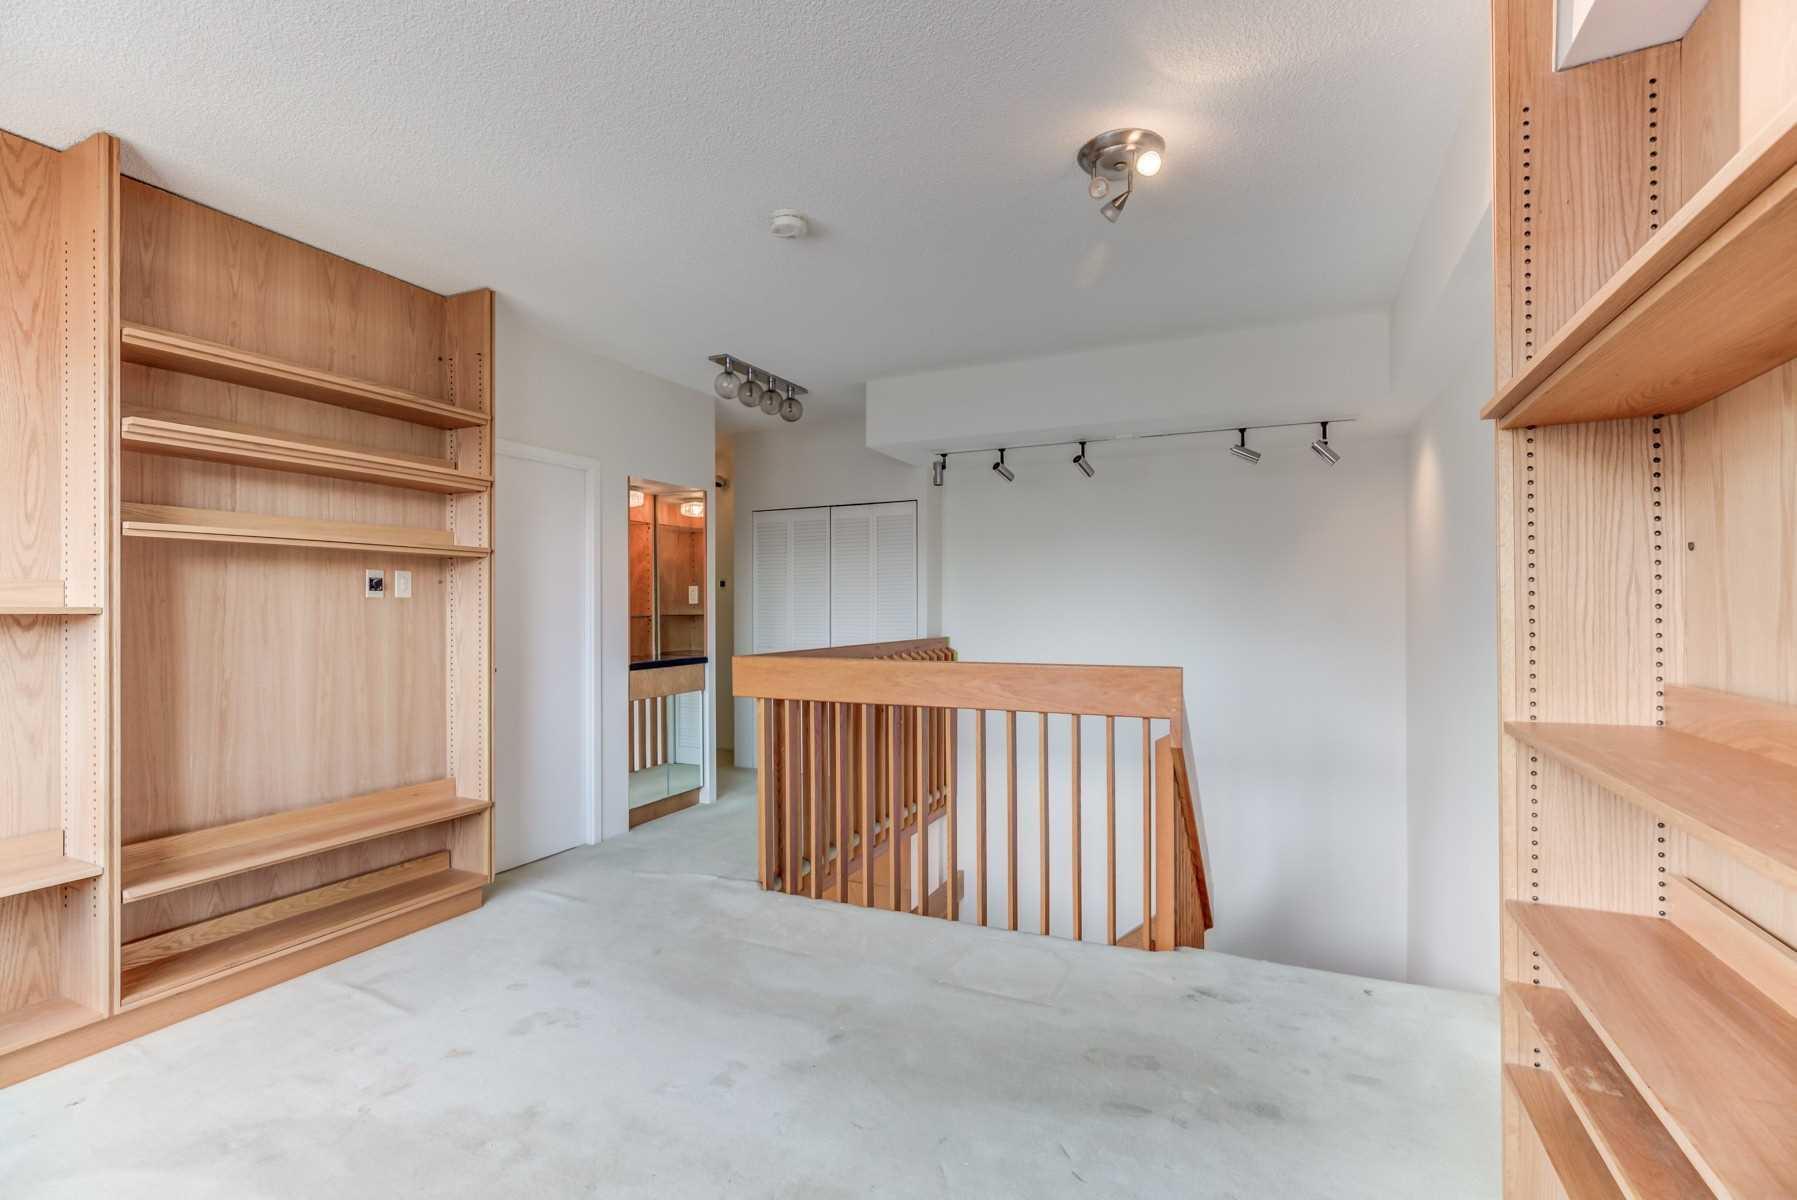 607 - 55A Avenue Rd - Annex Condo Apt for sale, 2 Bedrooms (C5185690) - #23